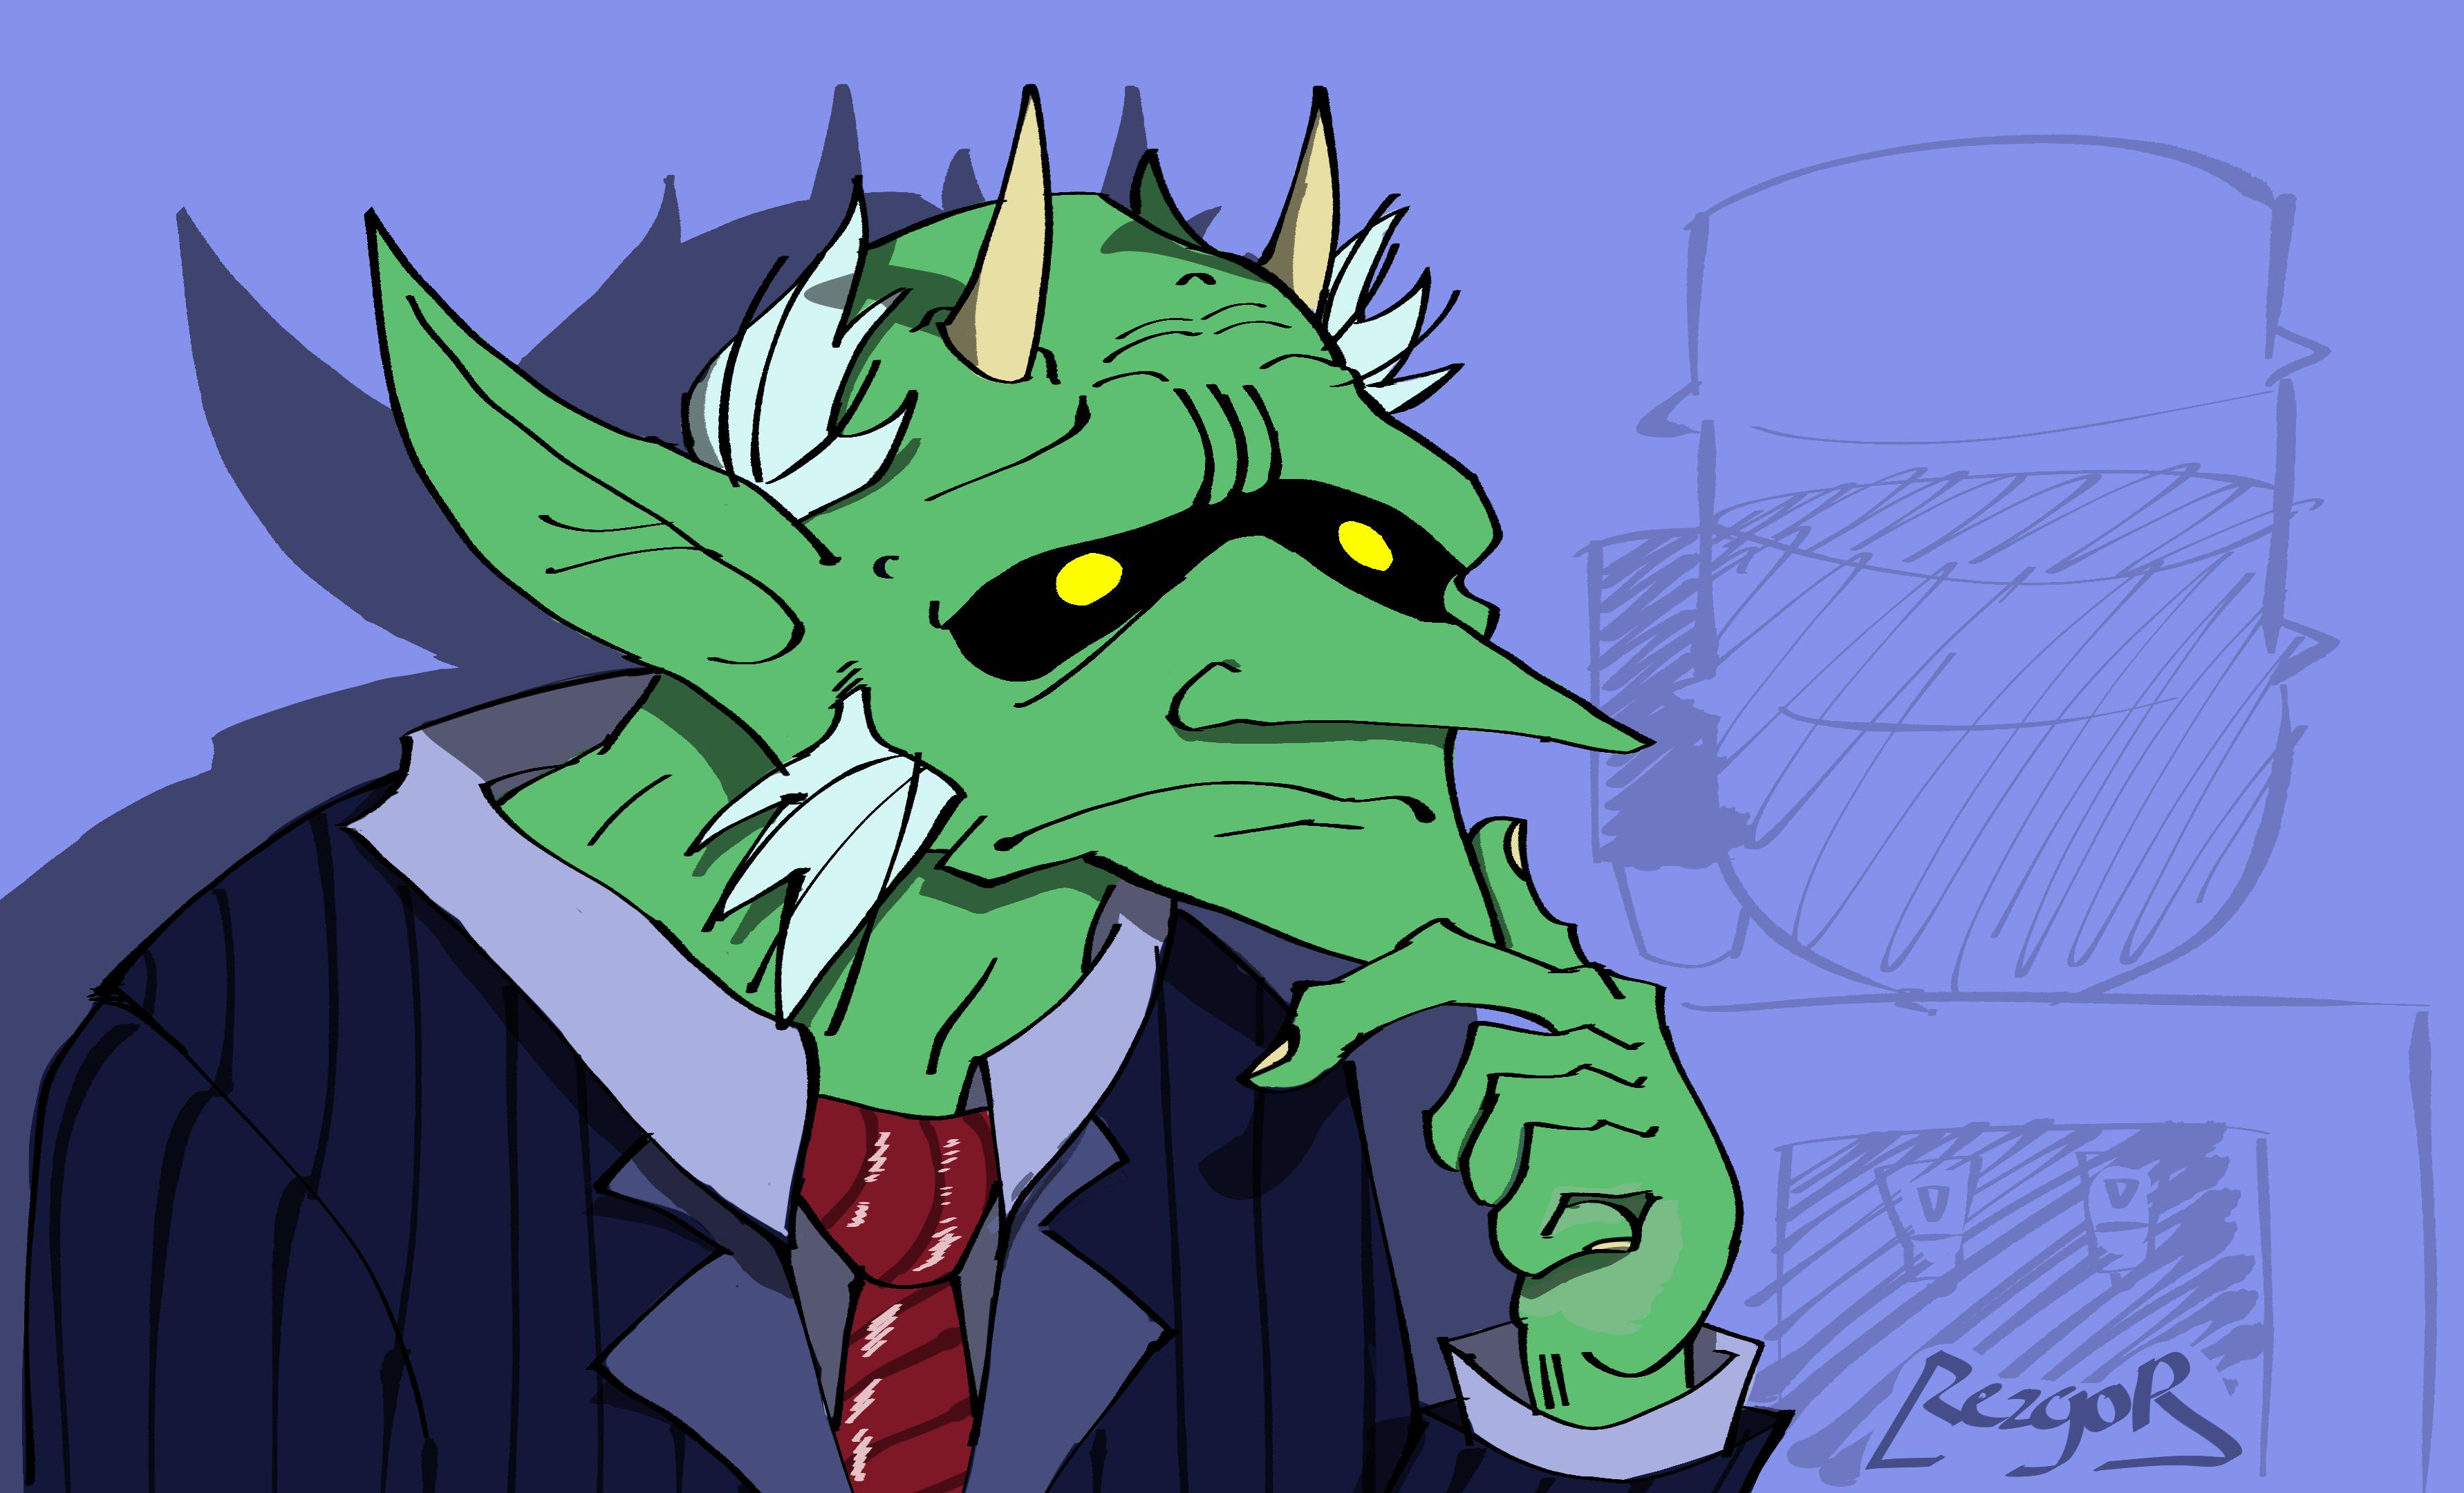 Fredrick, the Goblin Lawyer